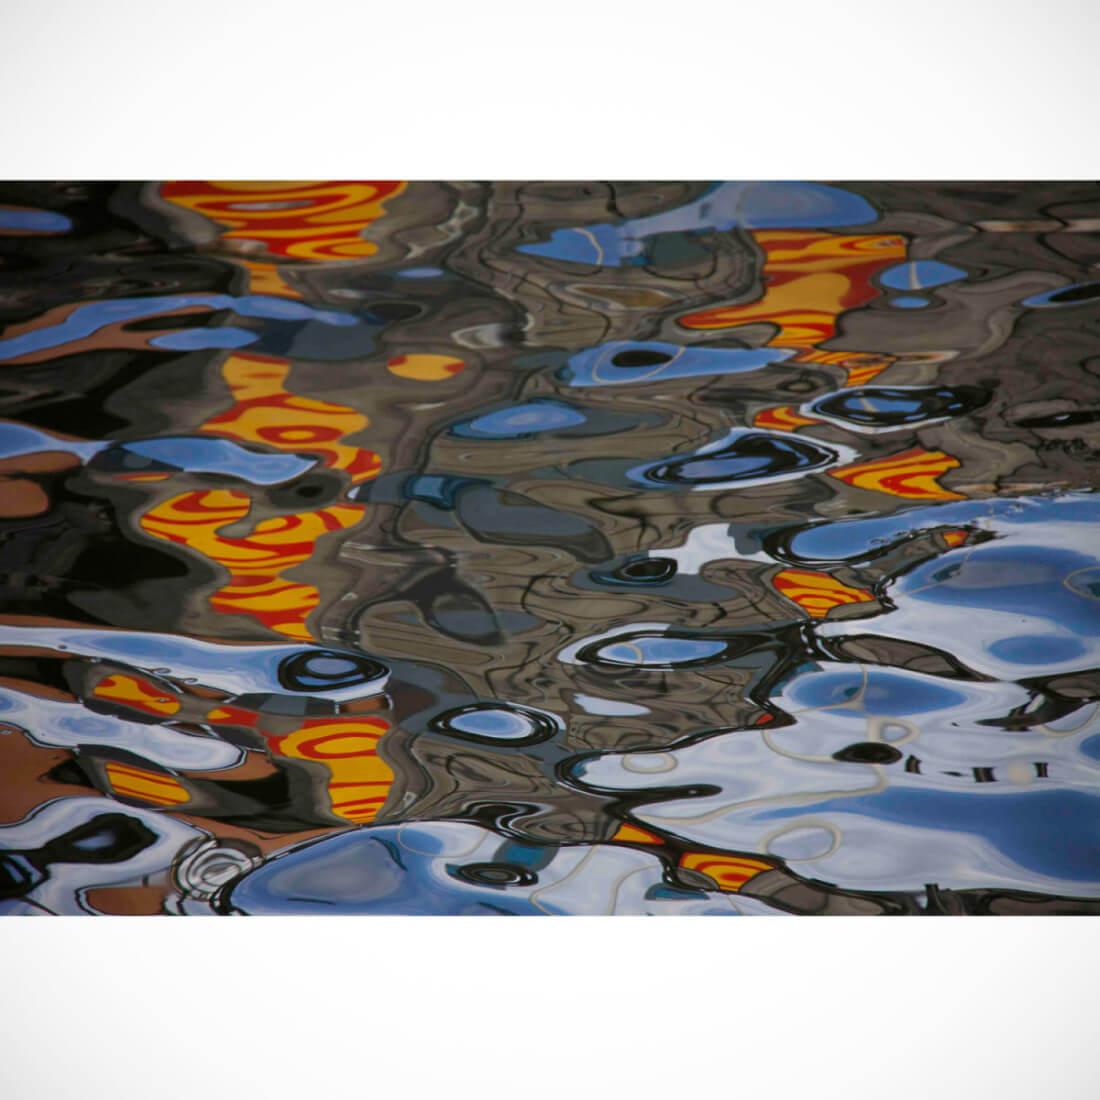 Michael T. Noonan |  Photography - wall art